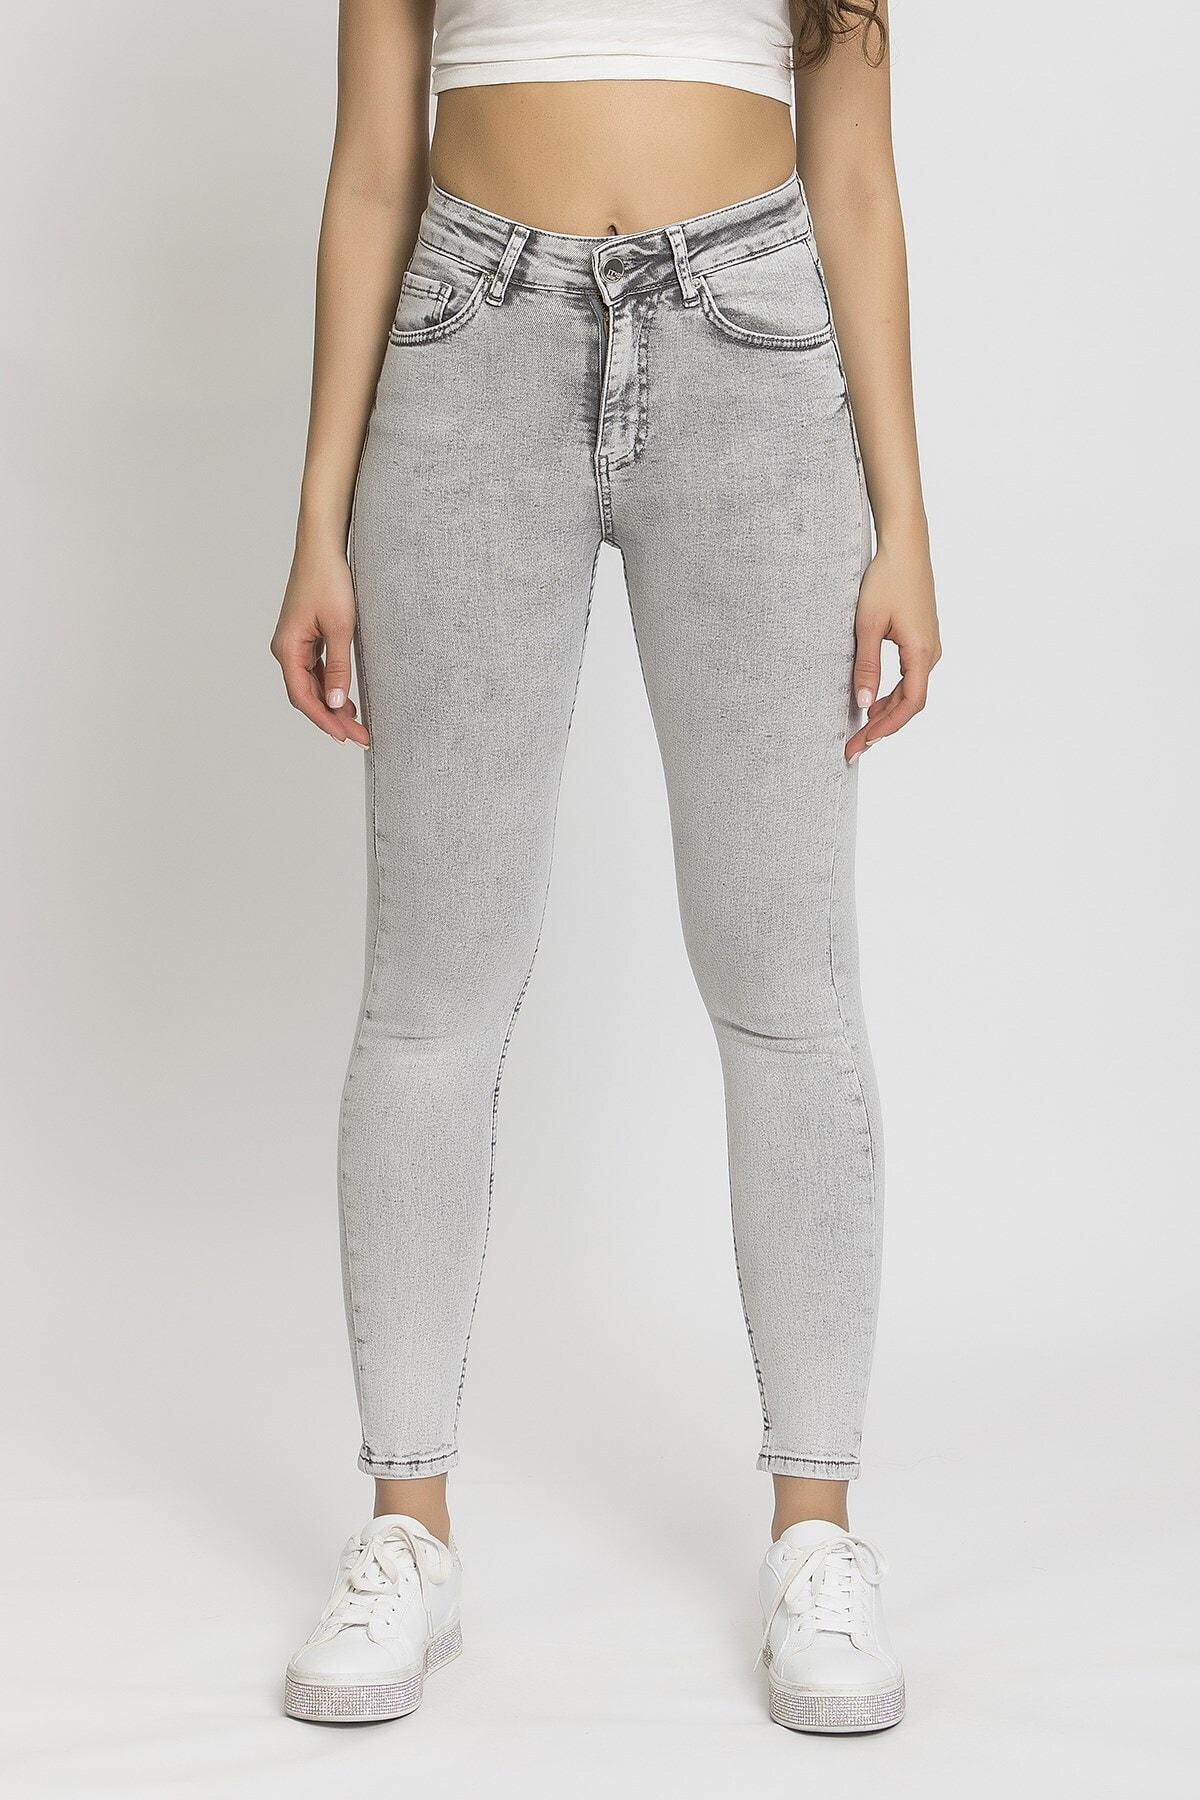 its basic Kadın Gri 5 Yüksek Bel Slim Fit Jean 1